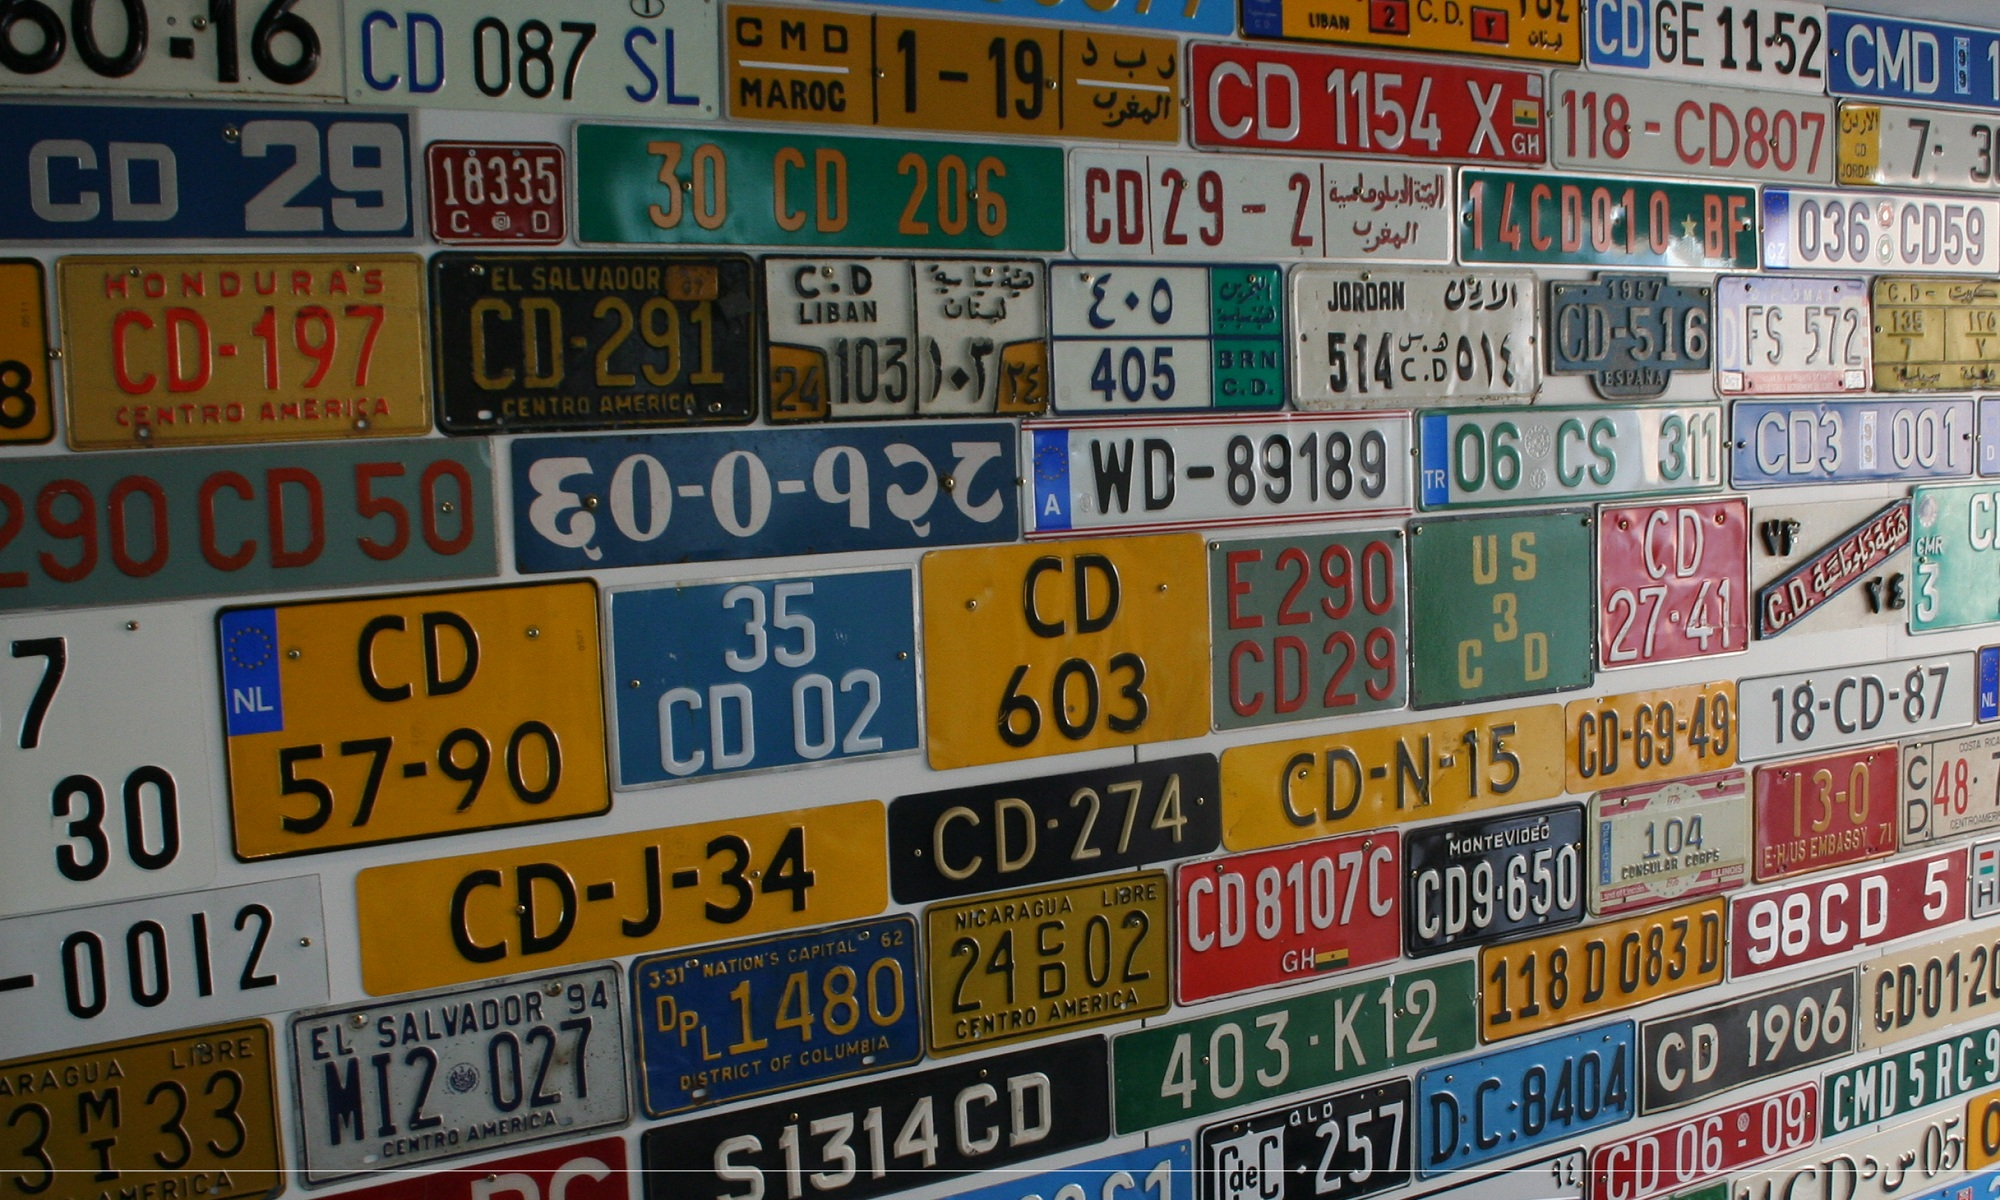 Diplomatic plates